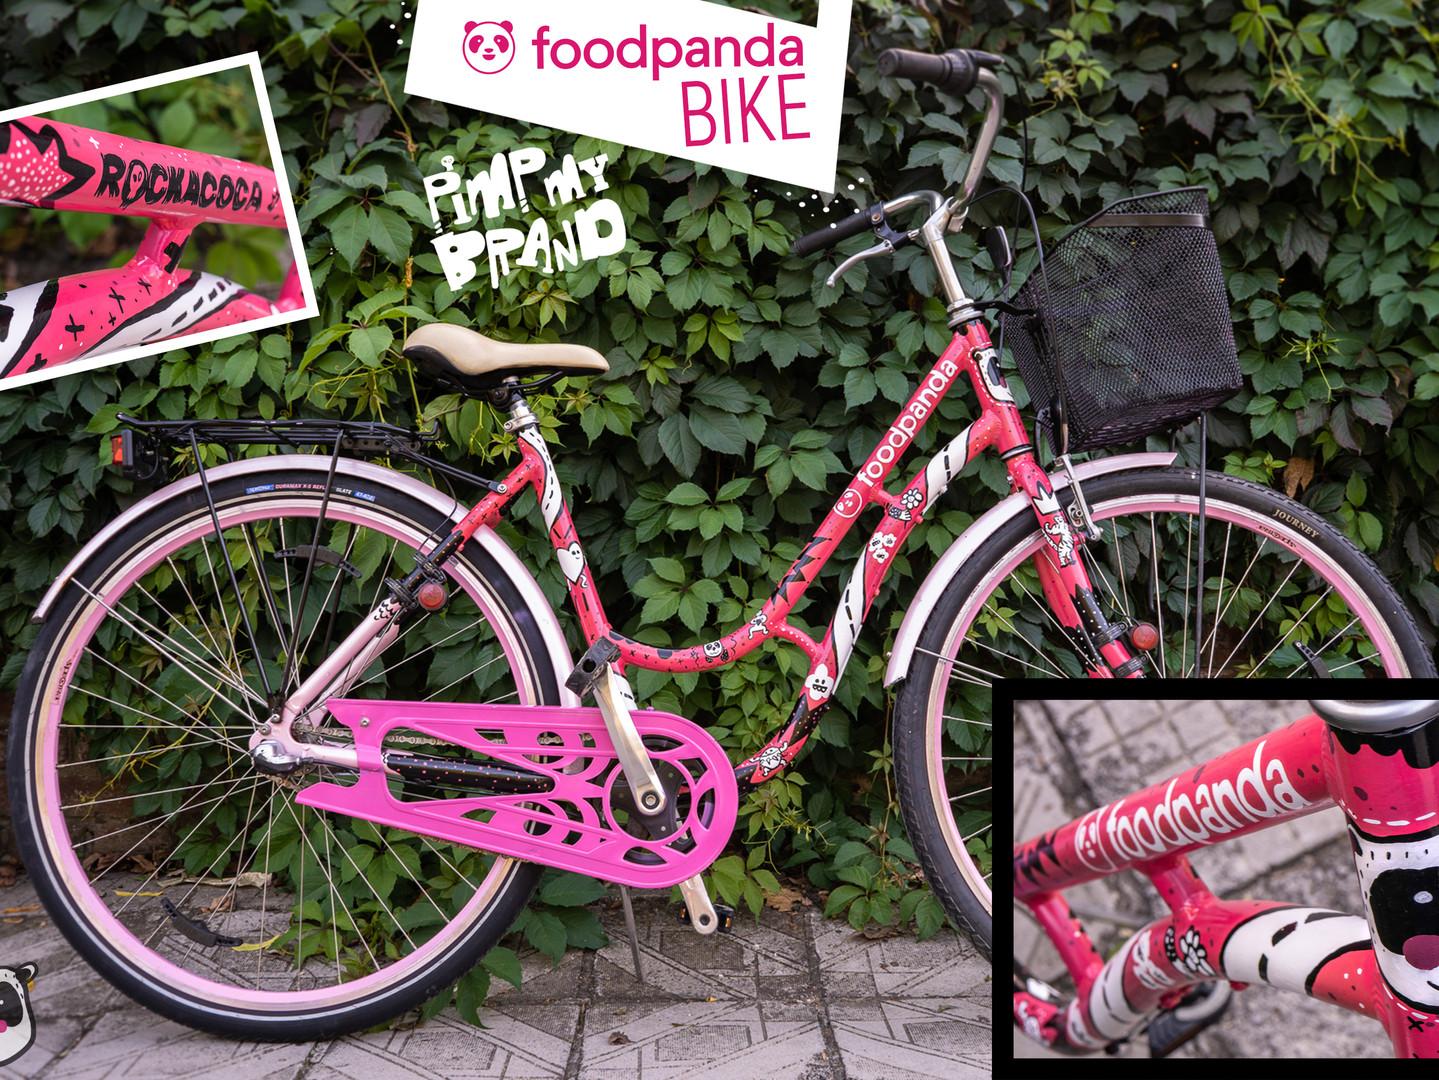 Food Panda bicycle